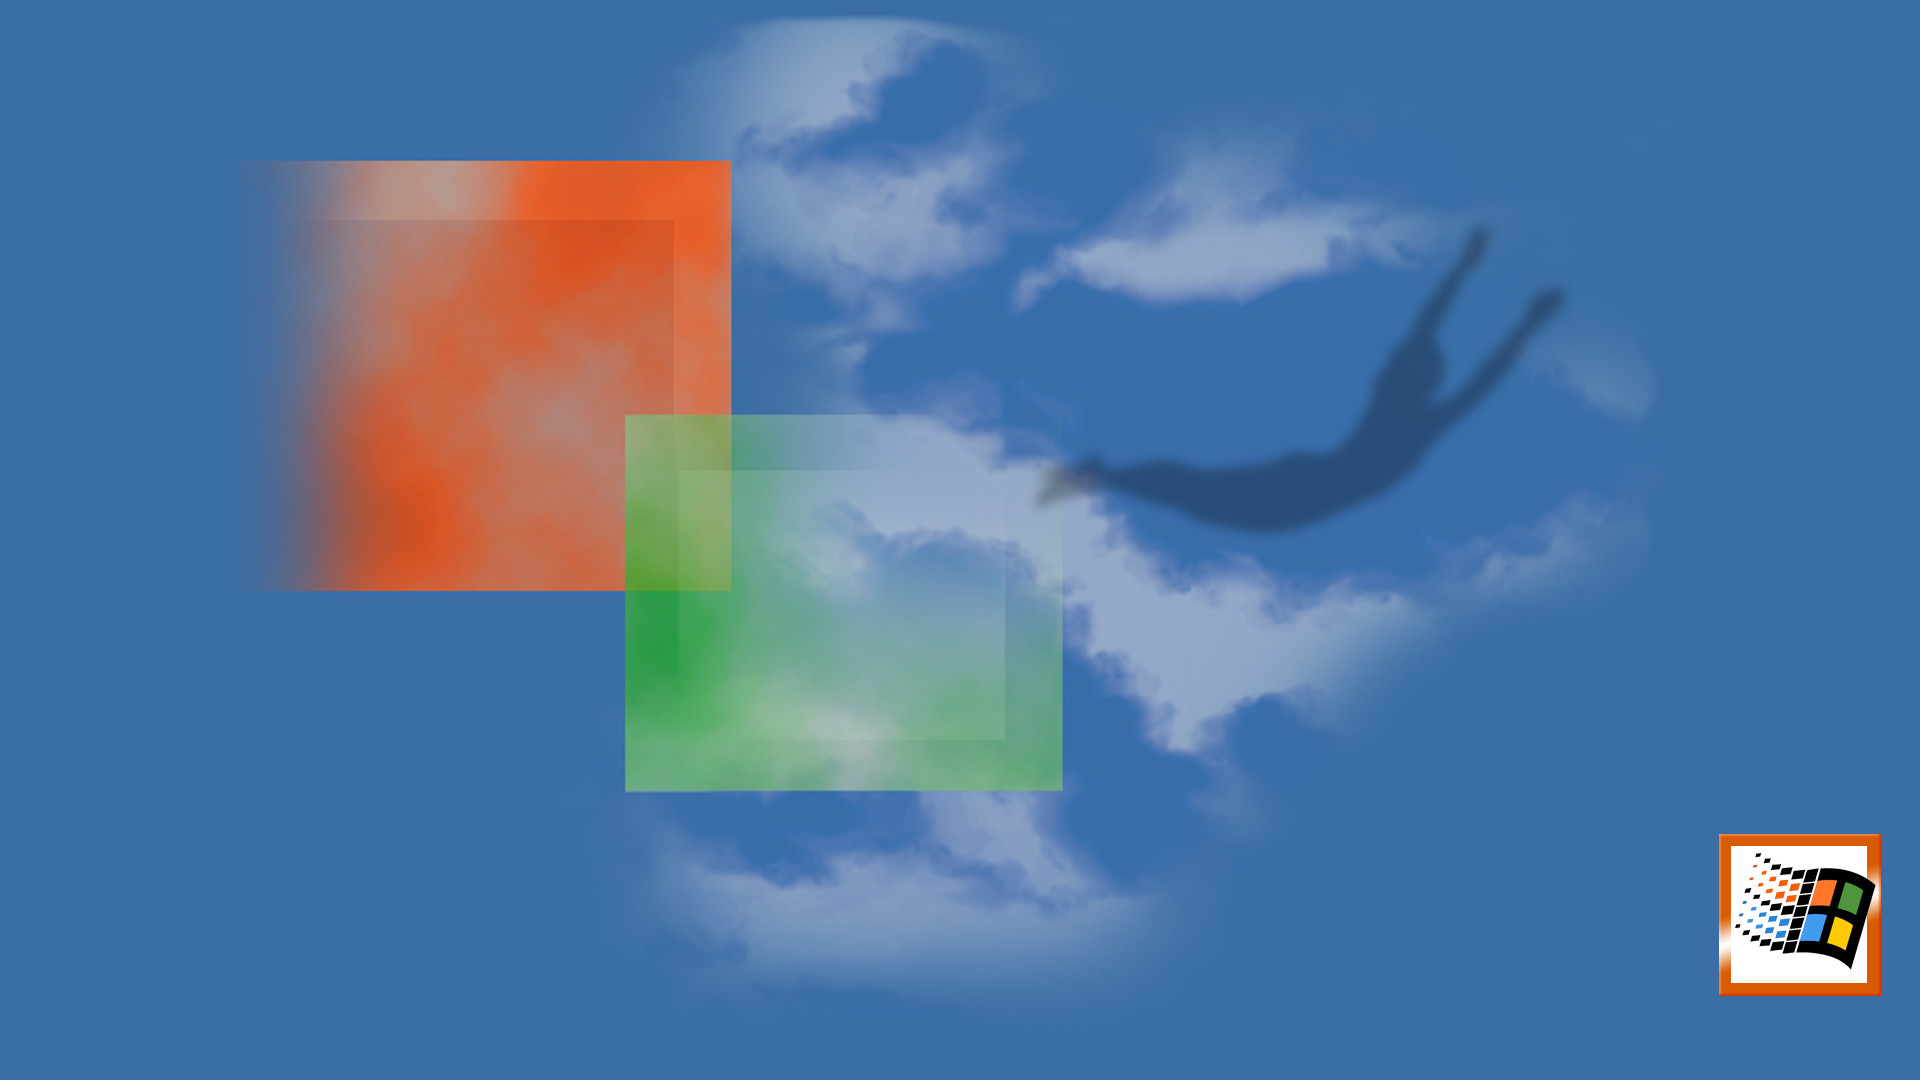 Windows > Download > Papel de parede retrô do Windows 95, 98, 2000 NT